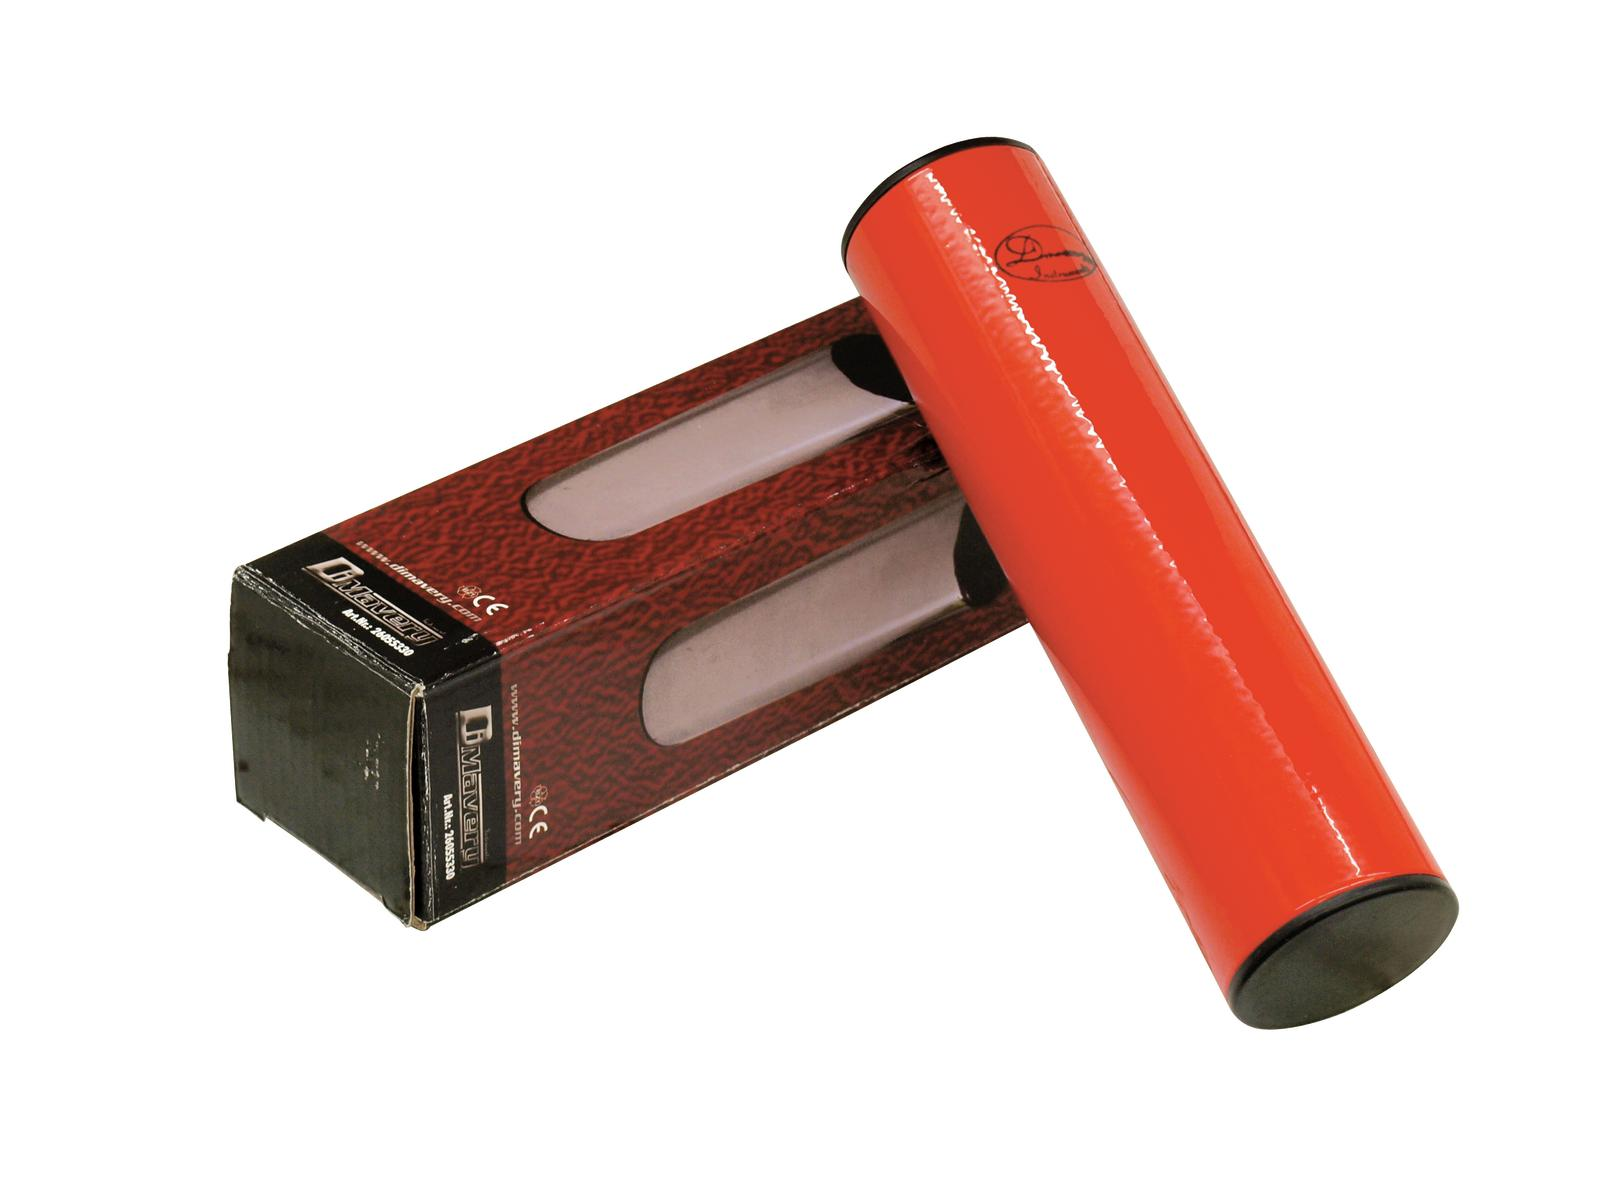 DIMAVERY Metallo-Shaker, rosso